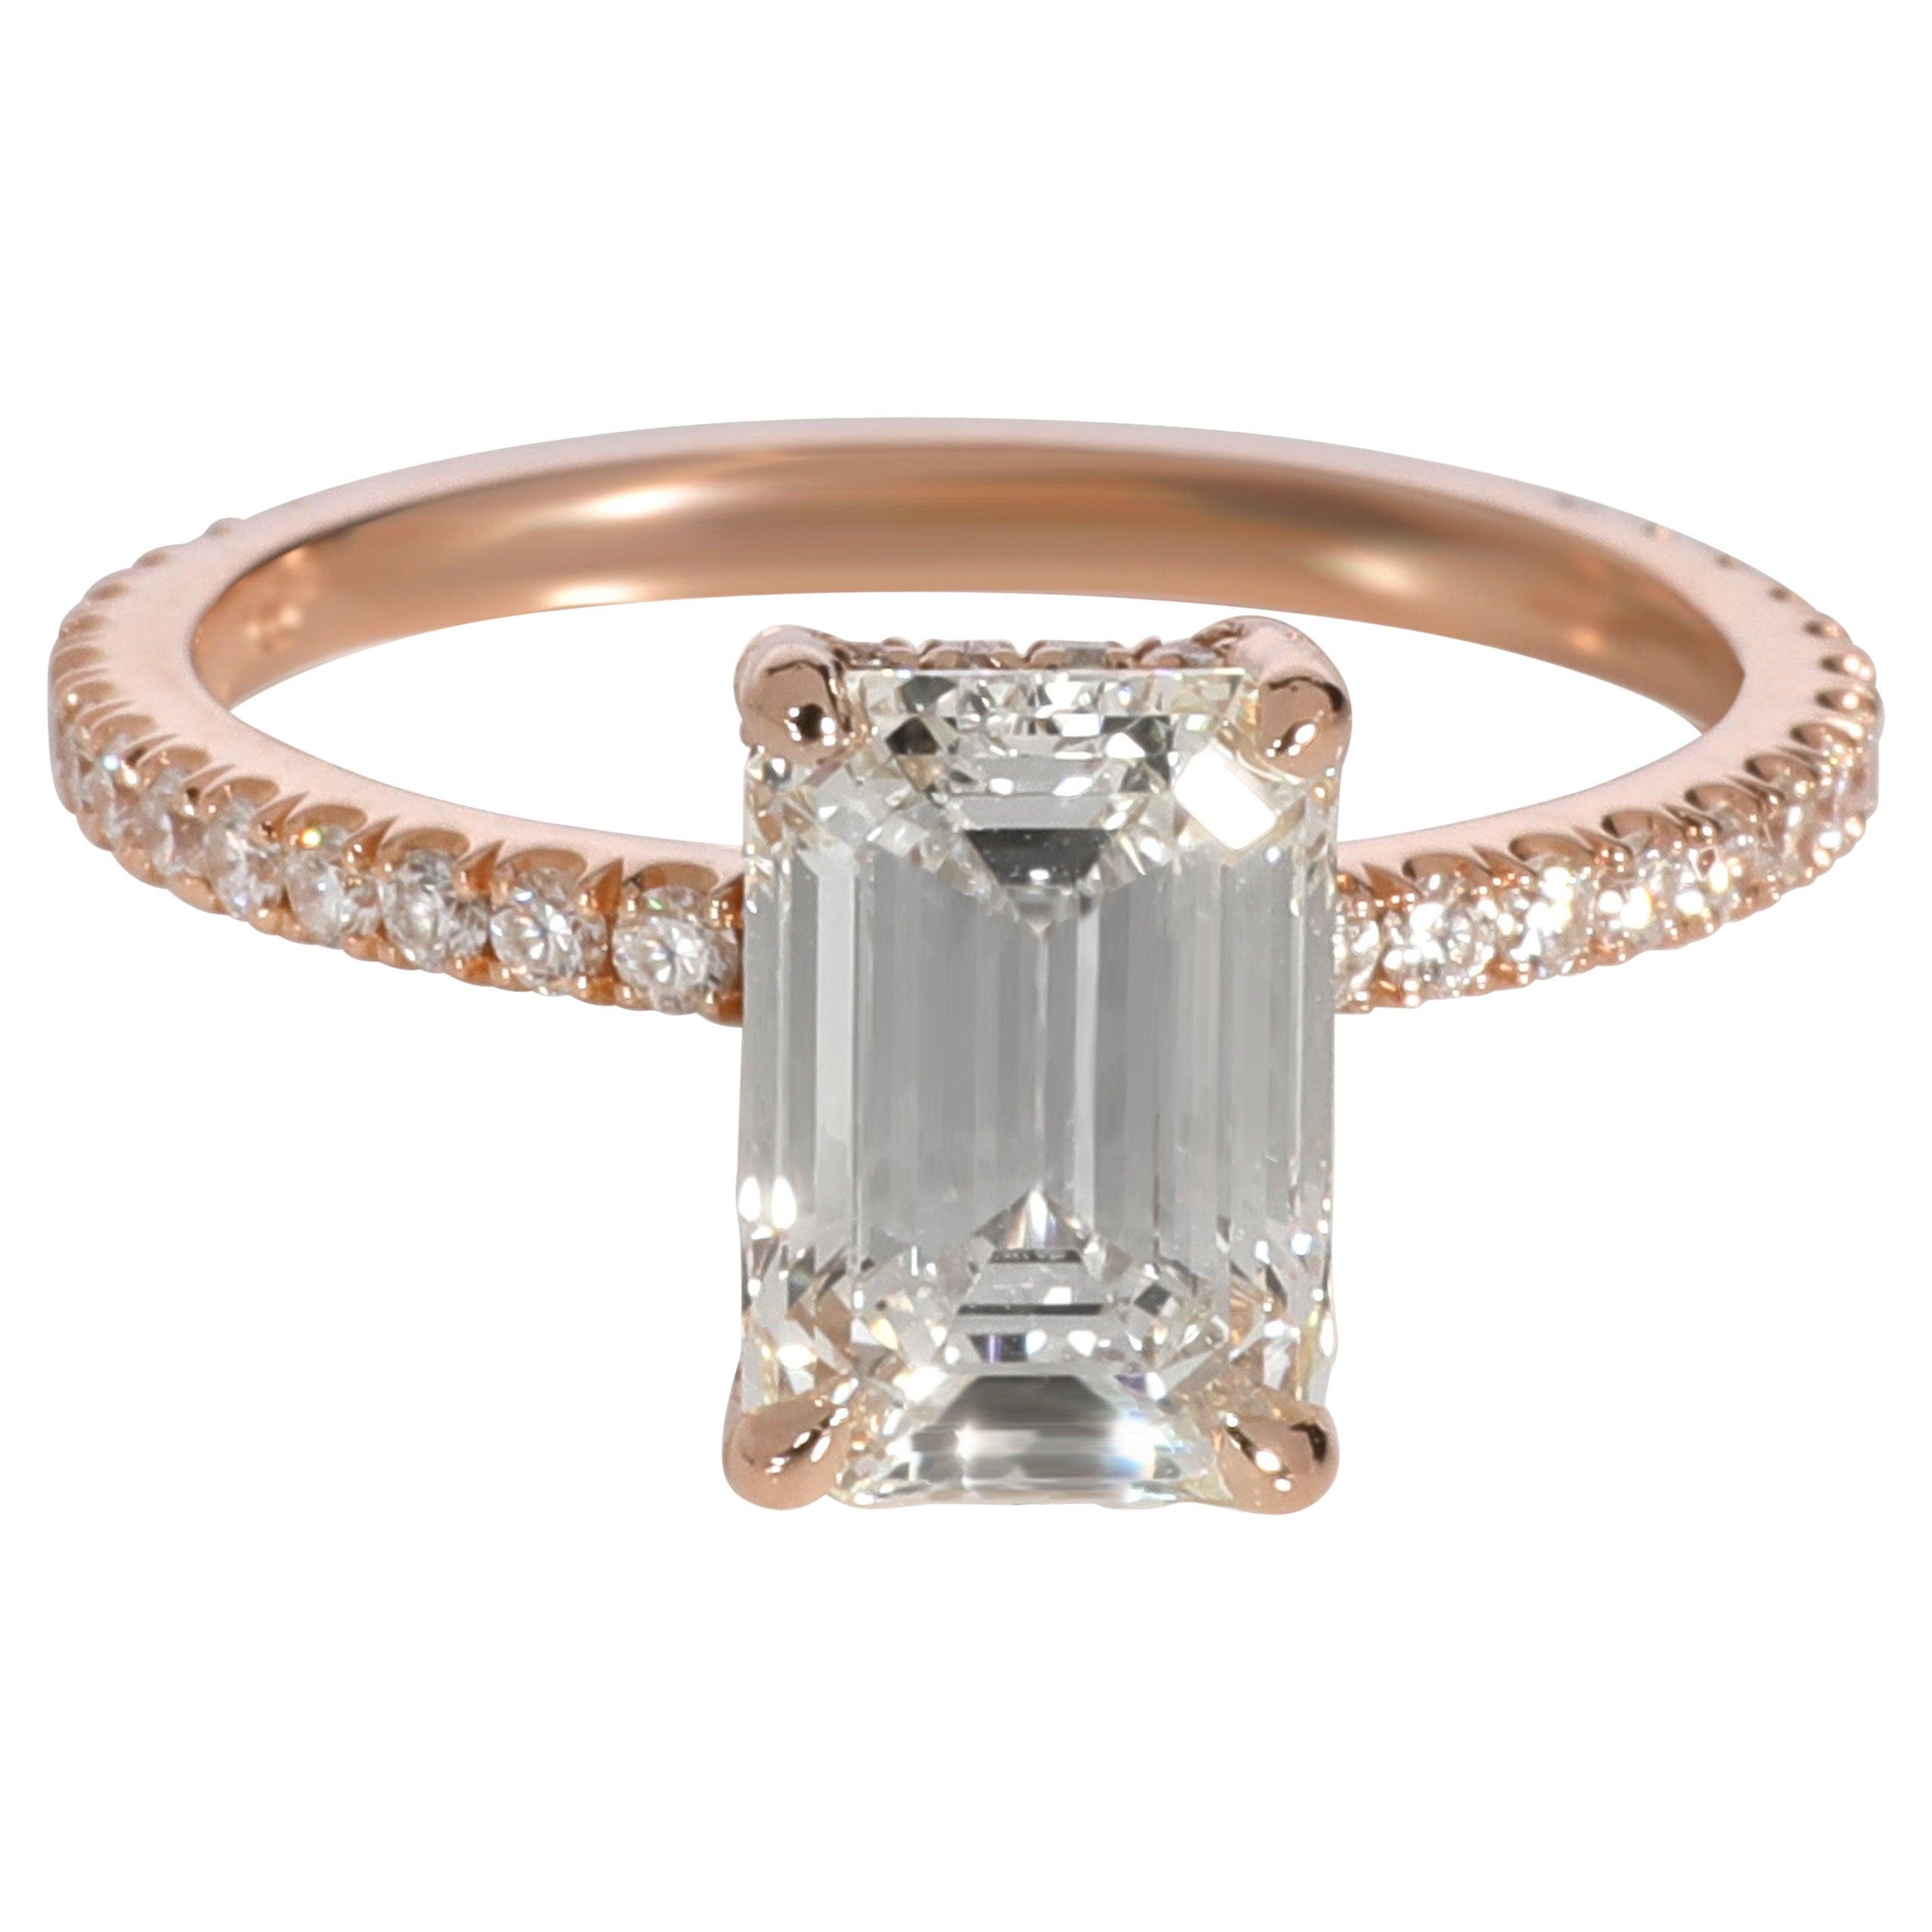 Mark Broumand Engagement Rings